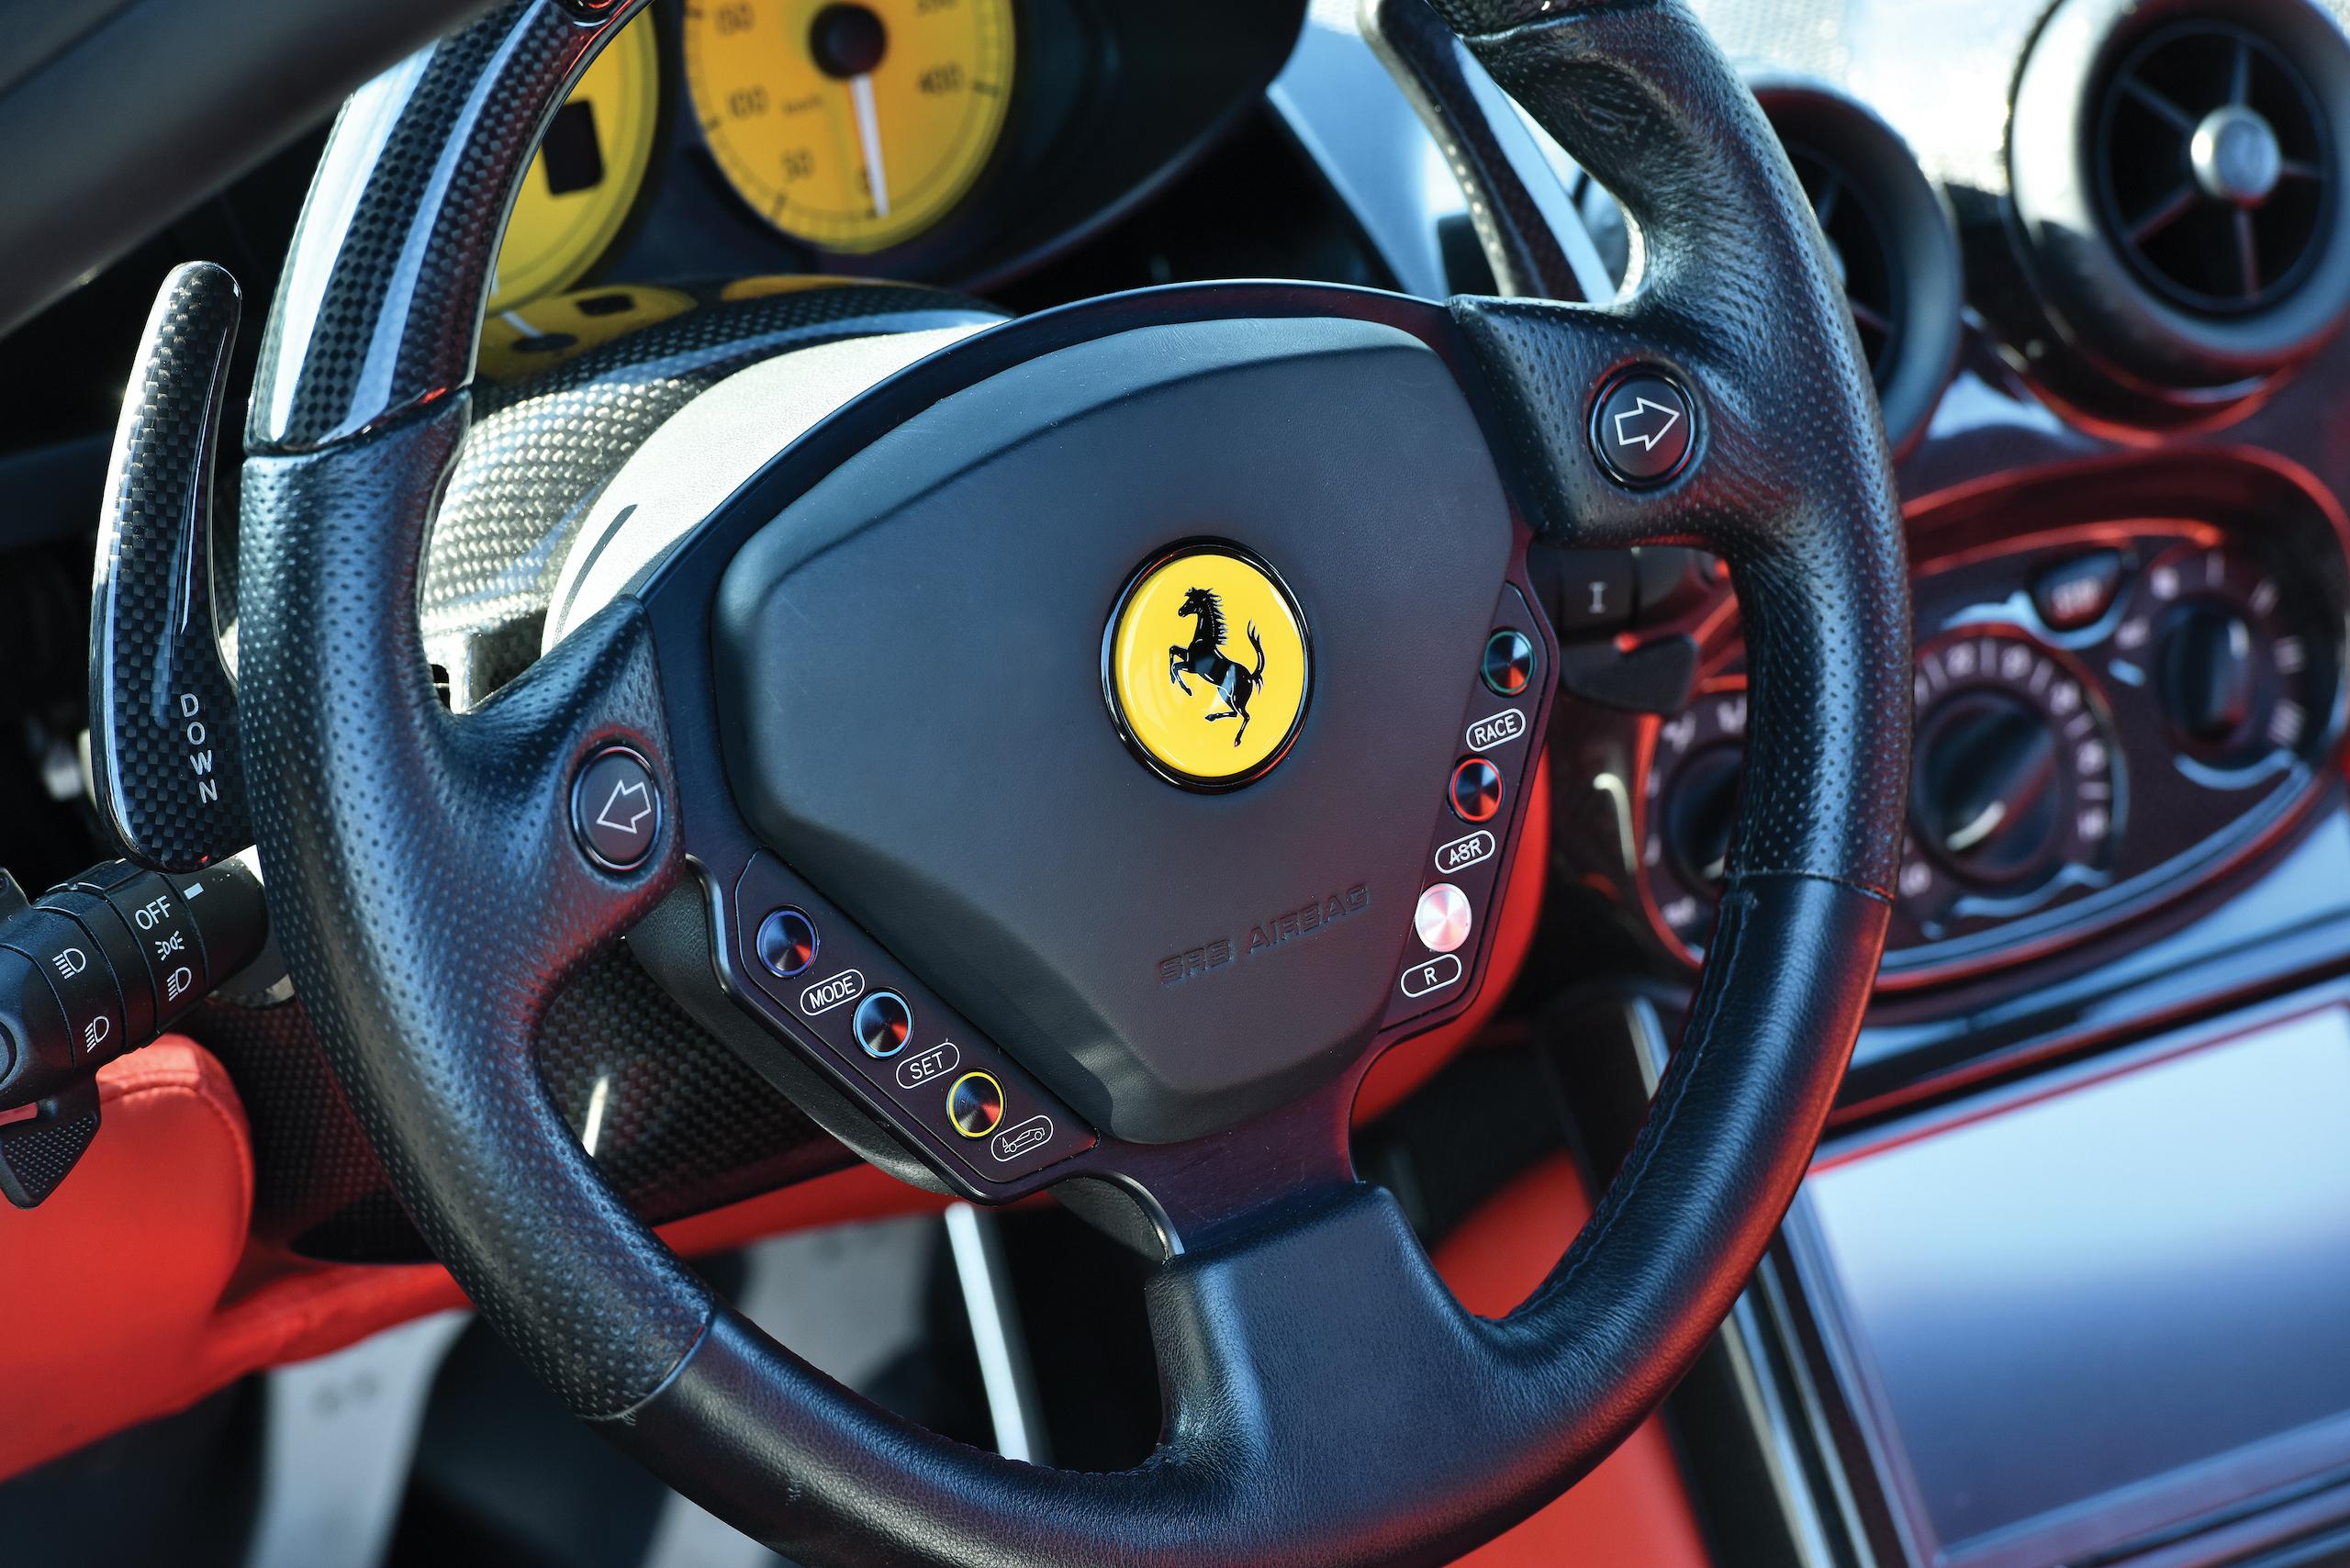 2004 Ferrari Enzo interior steering wheel detail